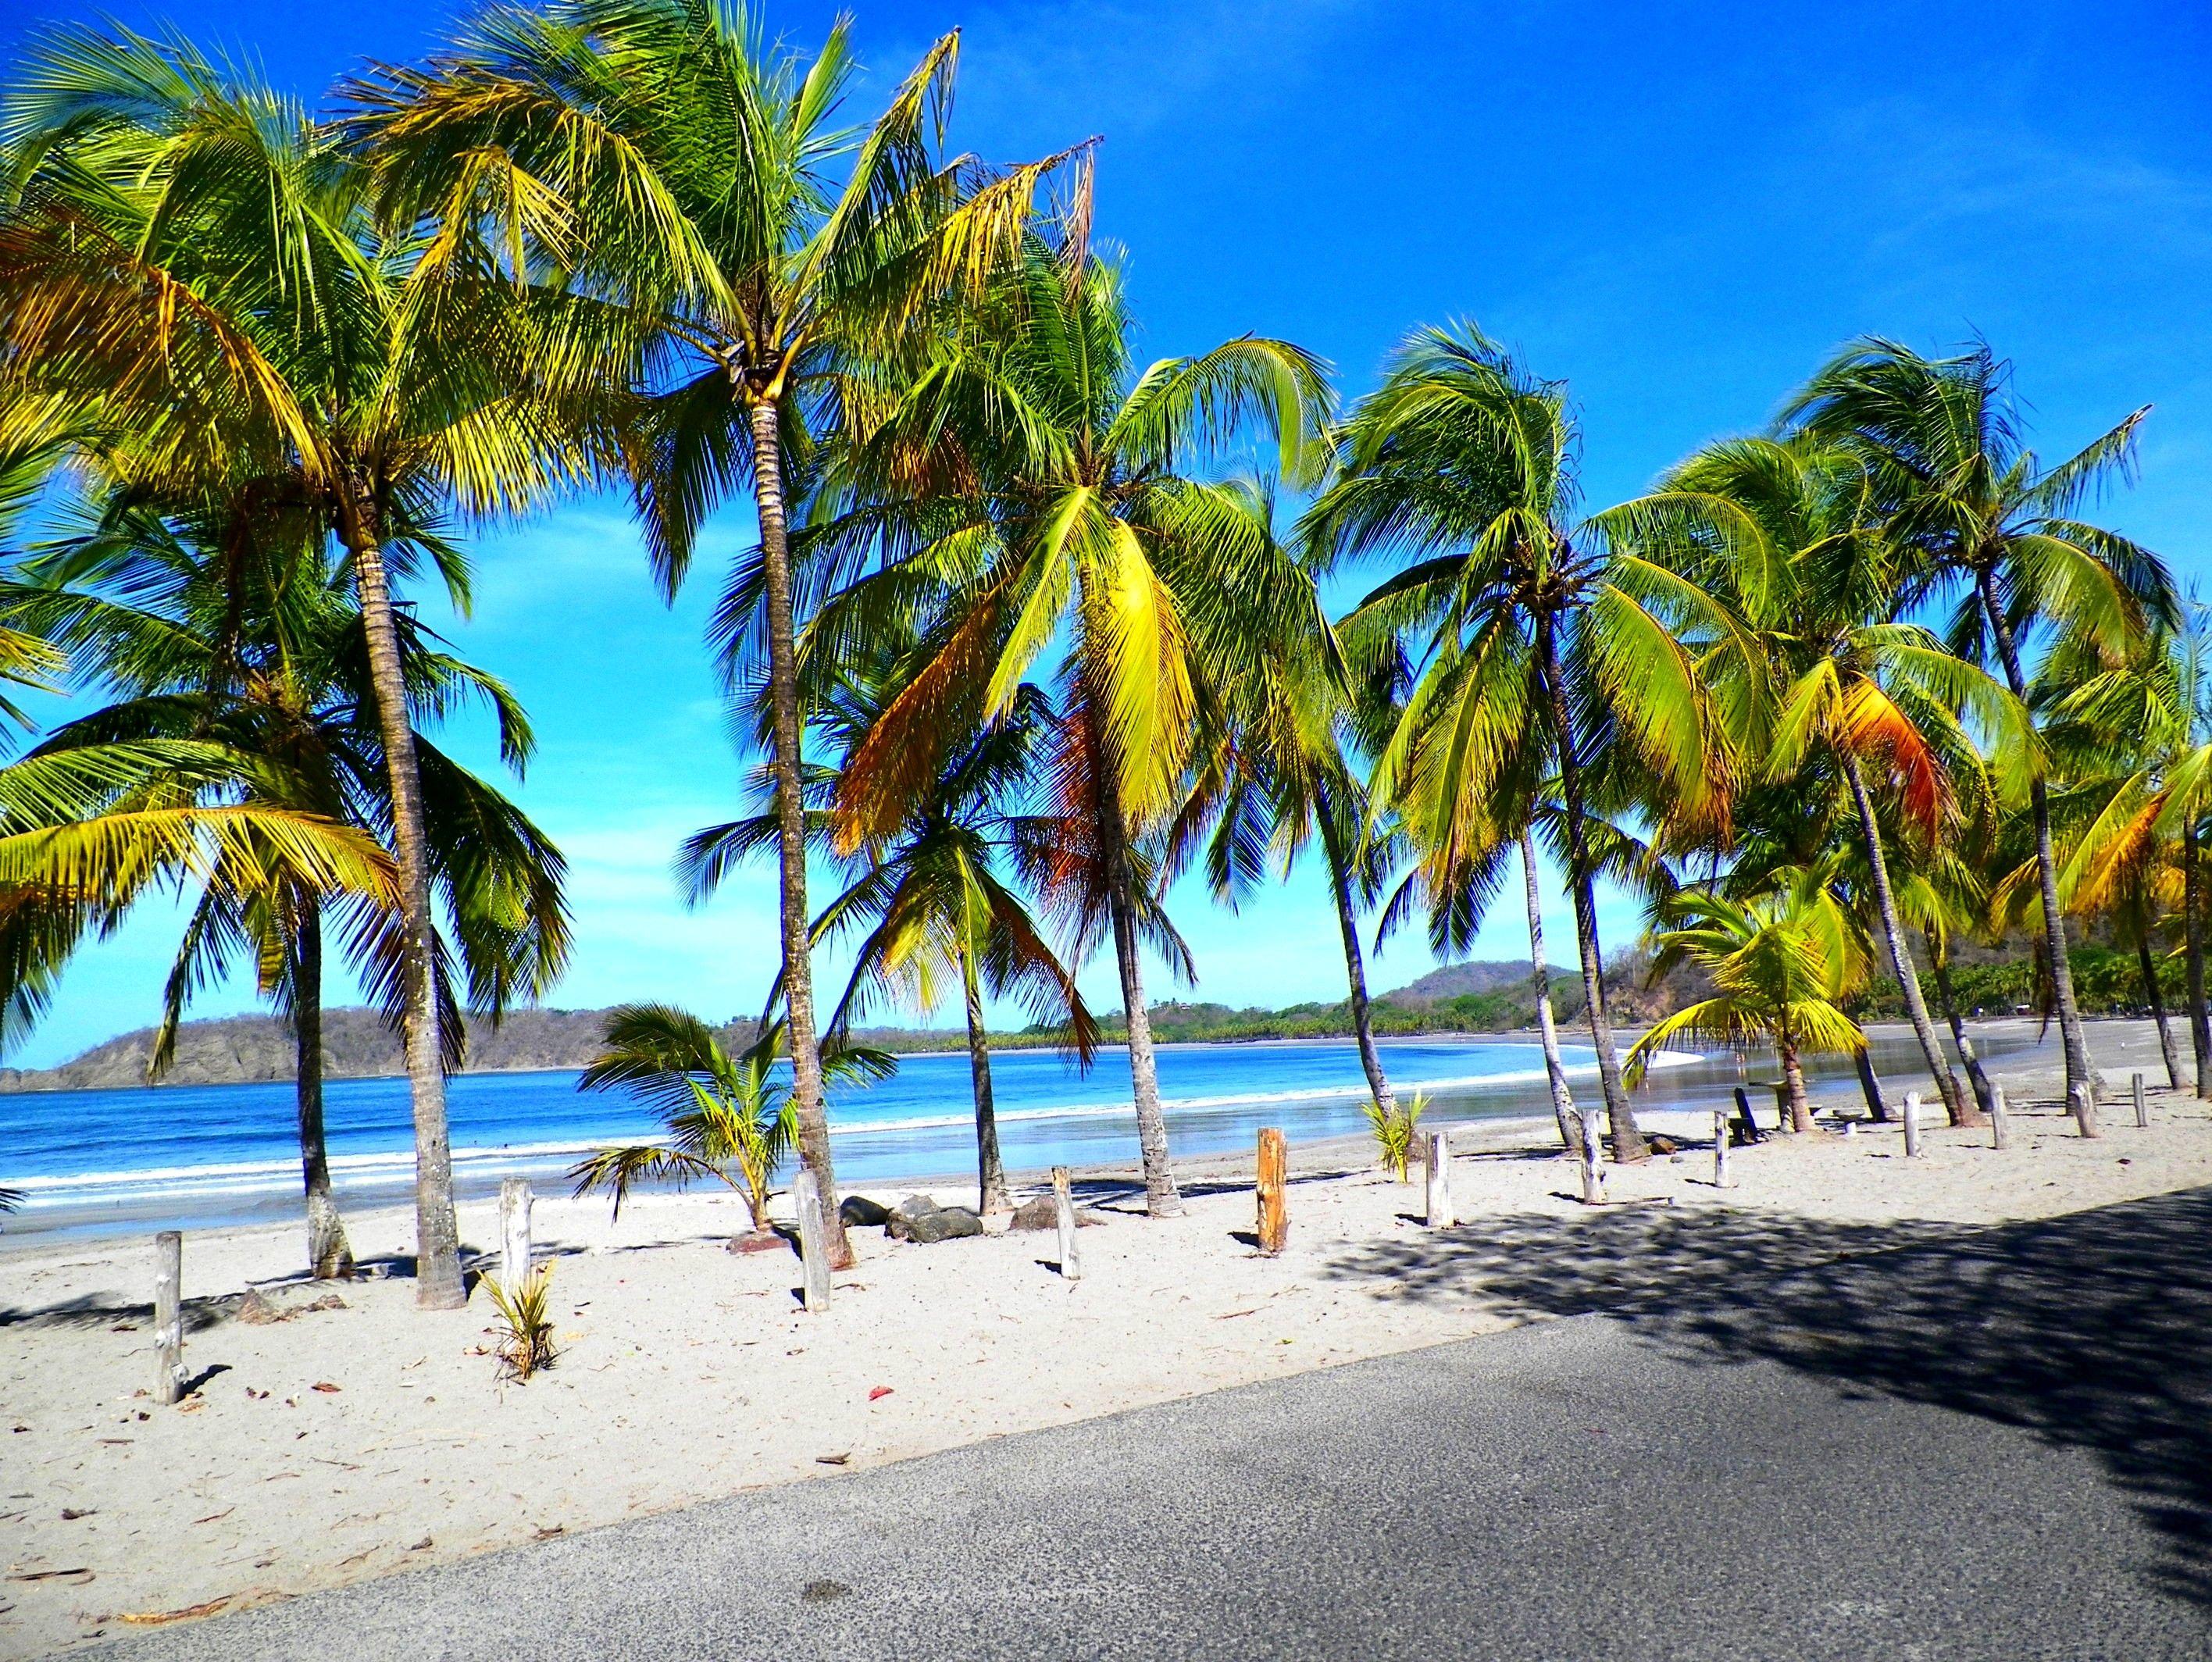 Playa Carrillo Guanacaste Costa Rica